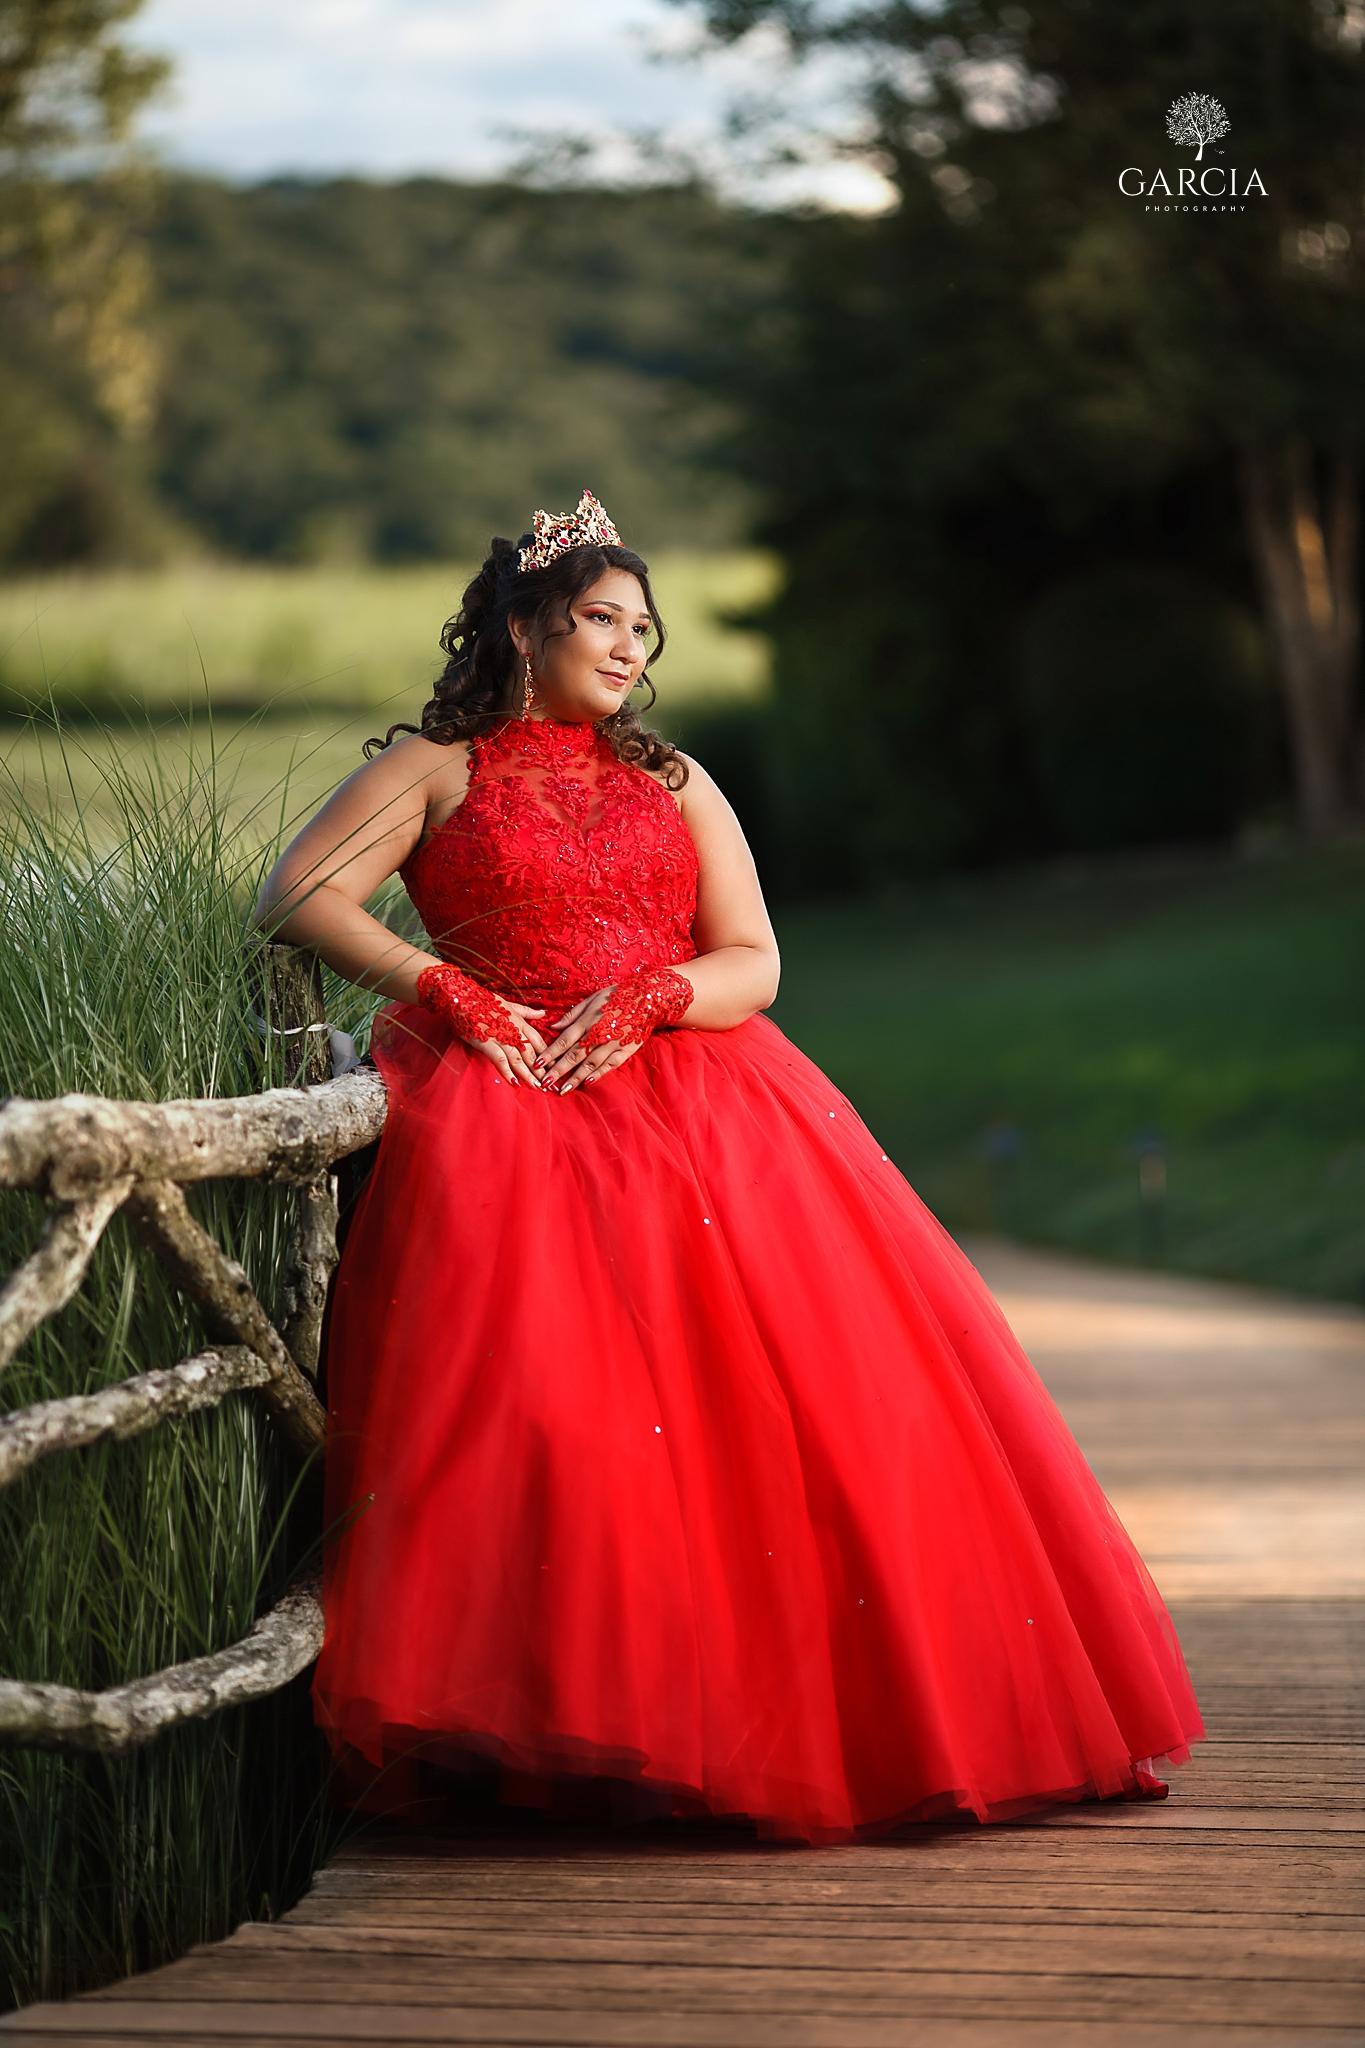 Anjali-Sweet-16-Garcia-Photography-8446.jpg